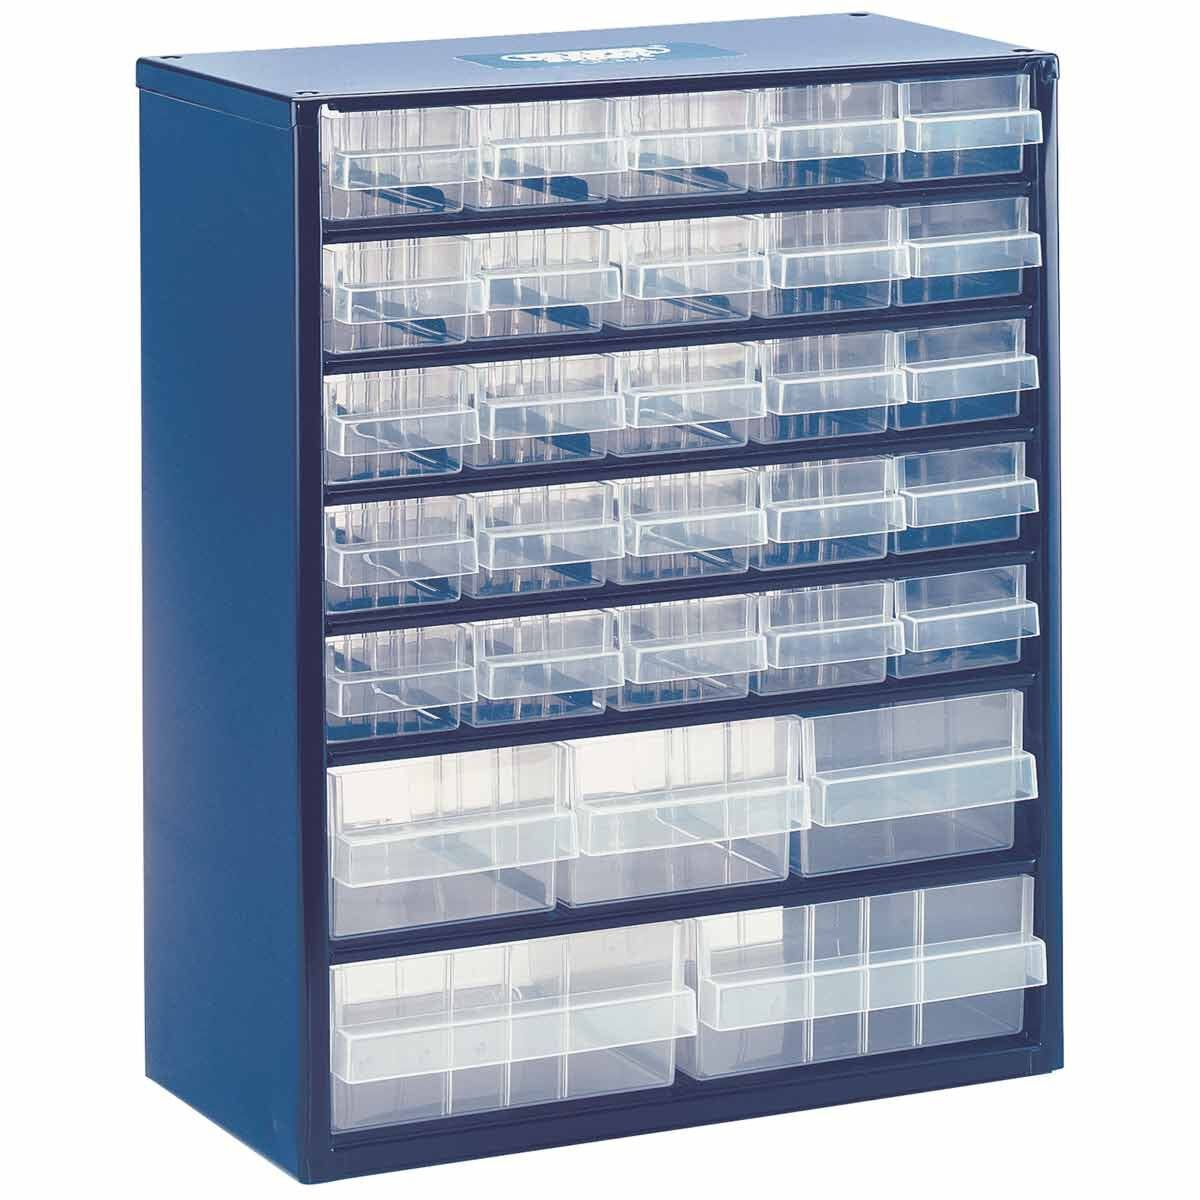 Draper 30 Drawer Storage Organiser